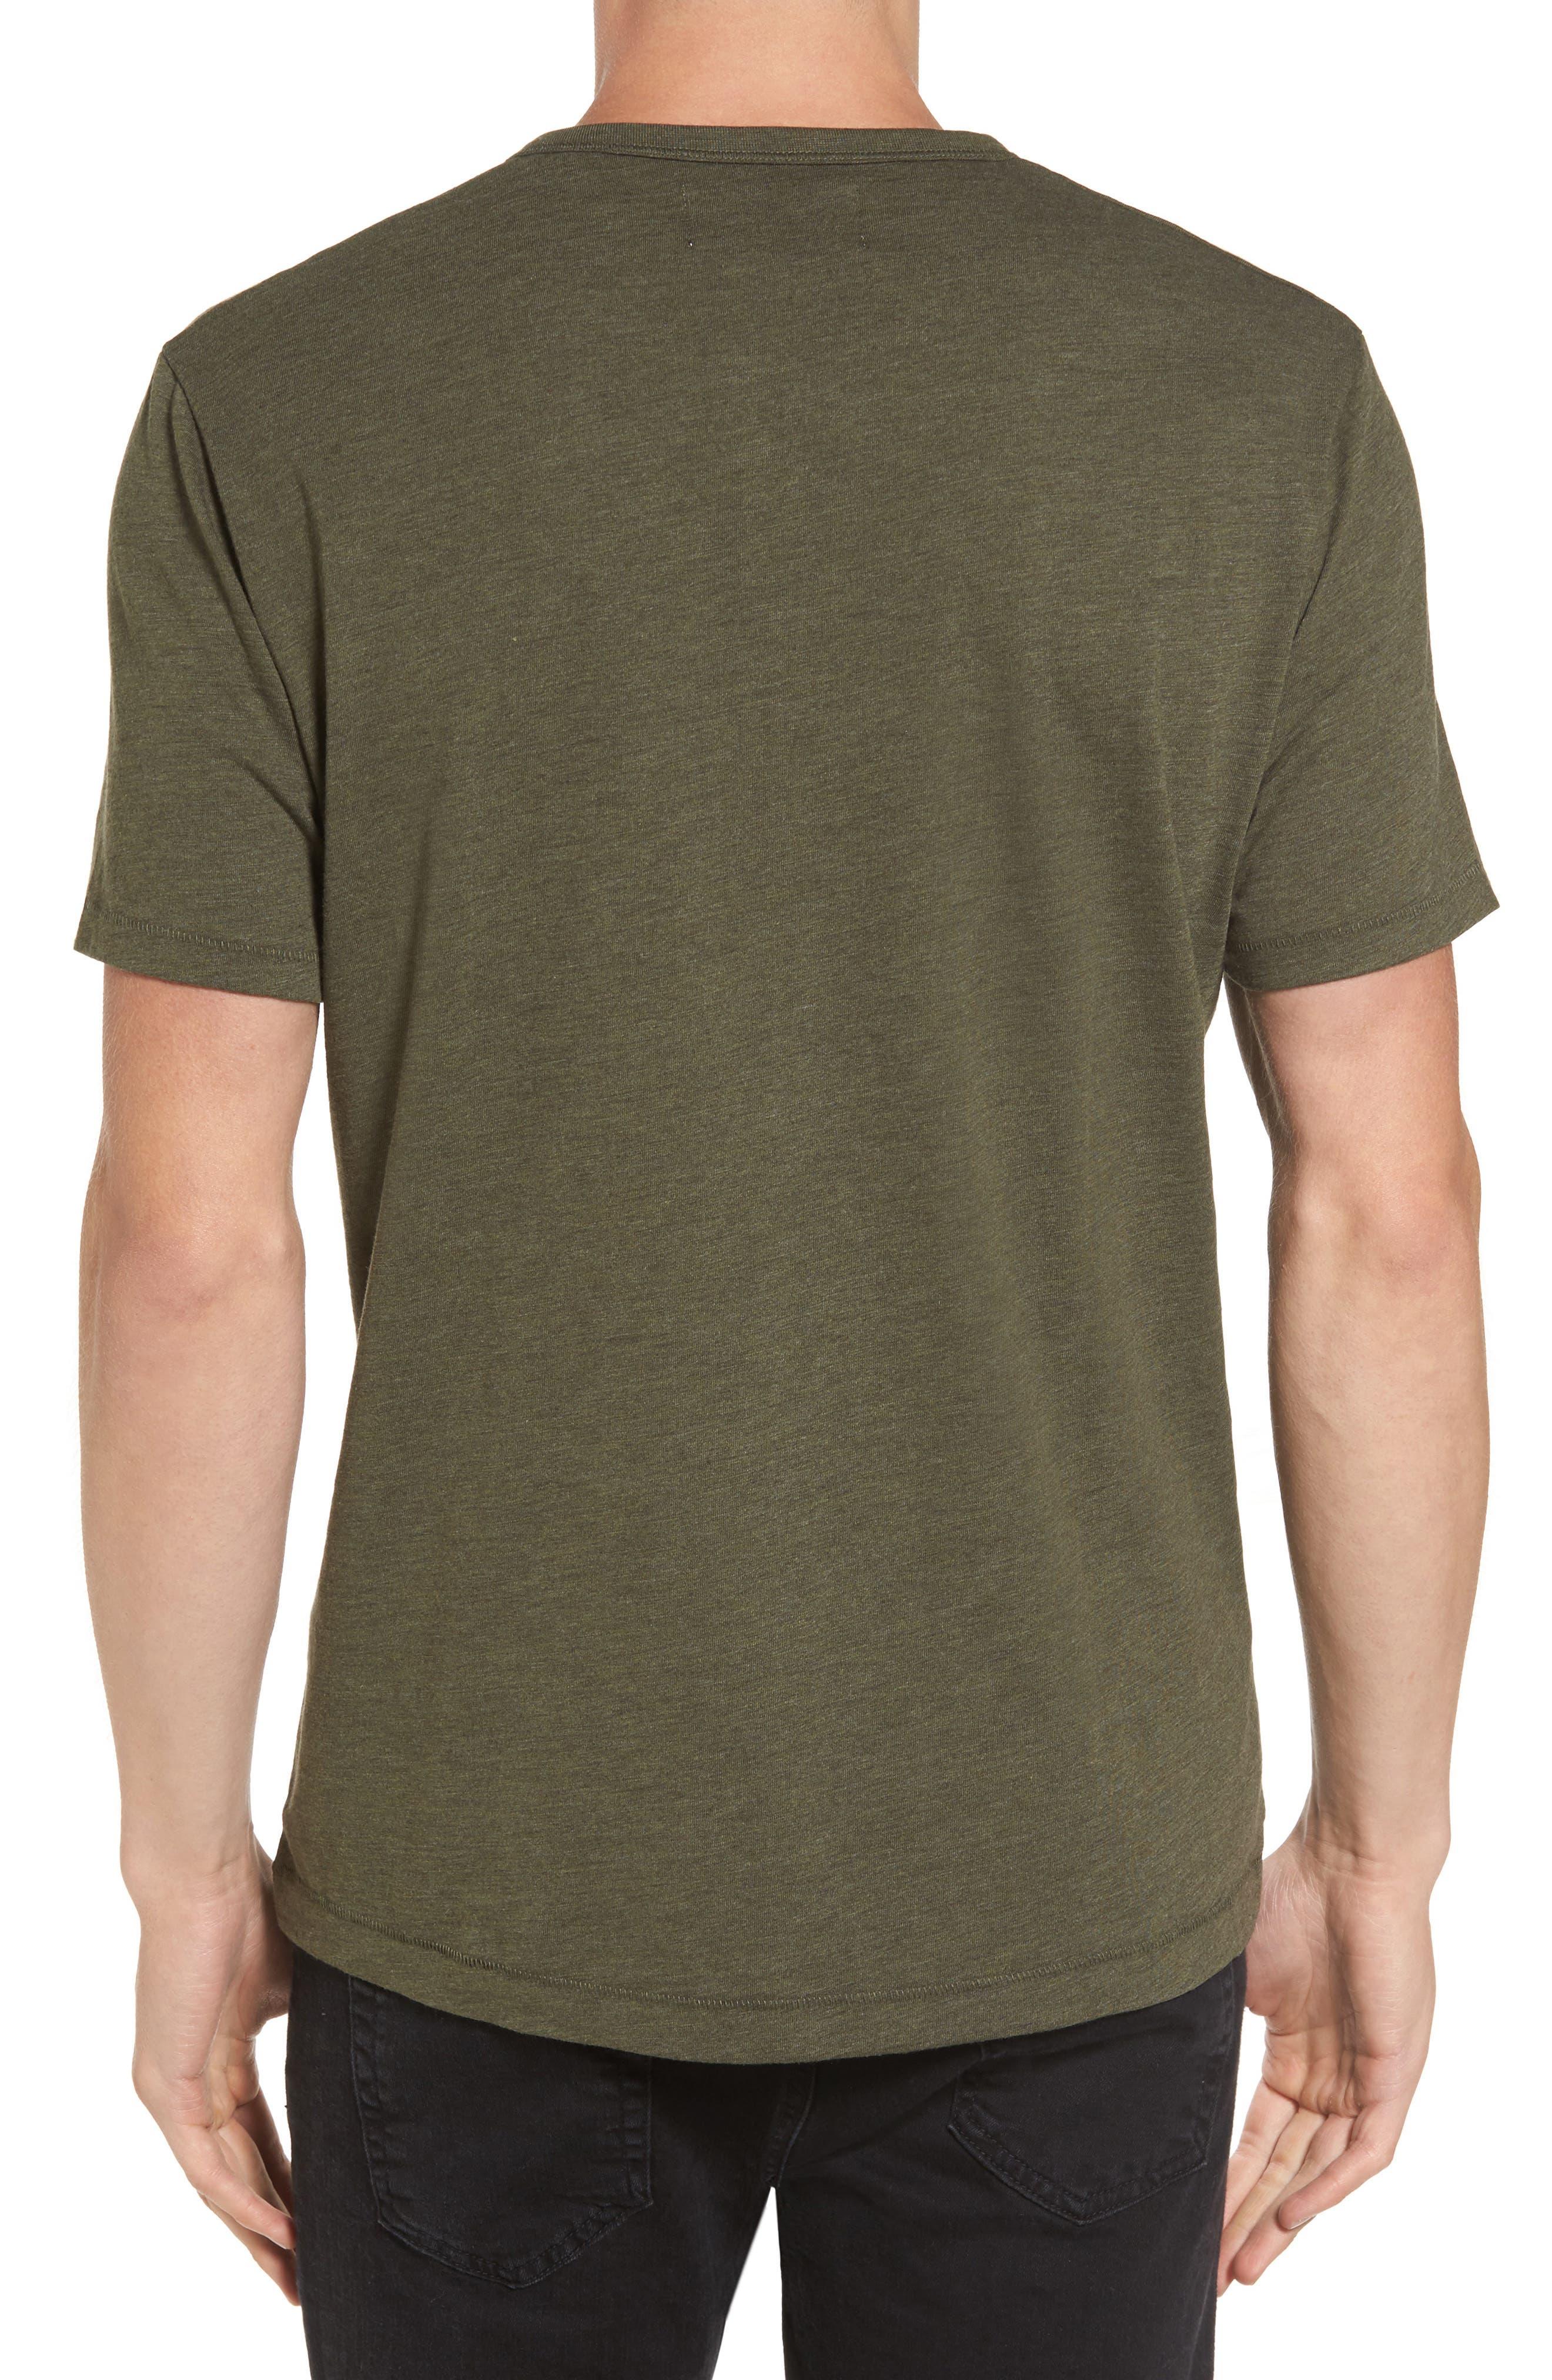 Bing Short Sleeve Henley Shirt,                             Alternate thumbnail 2, color,                             306